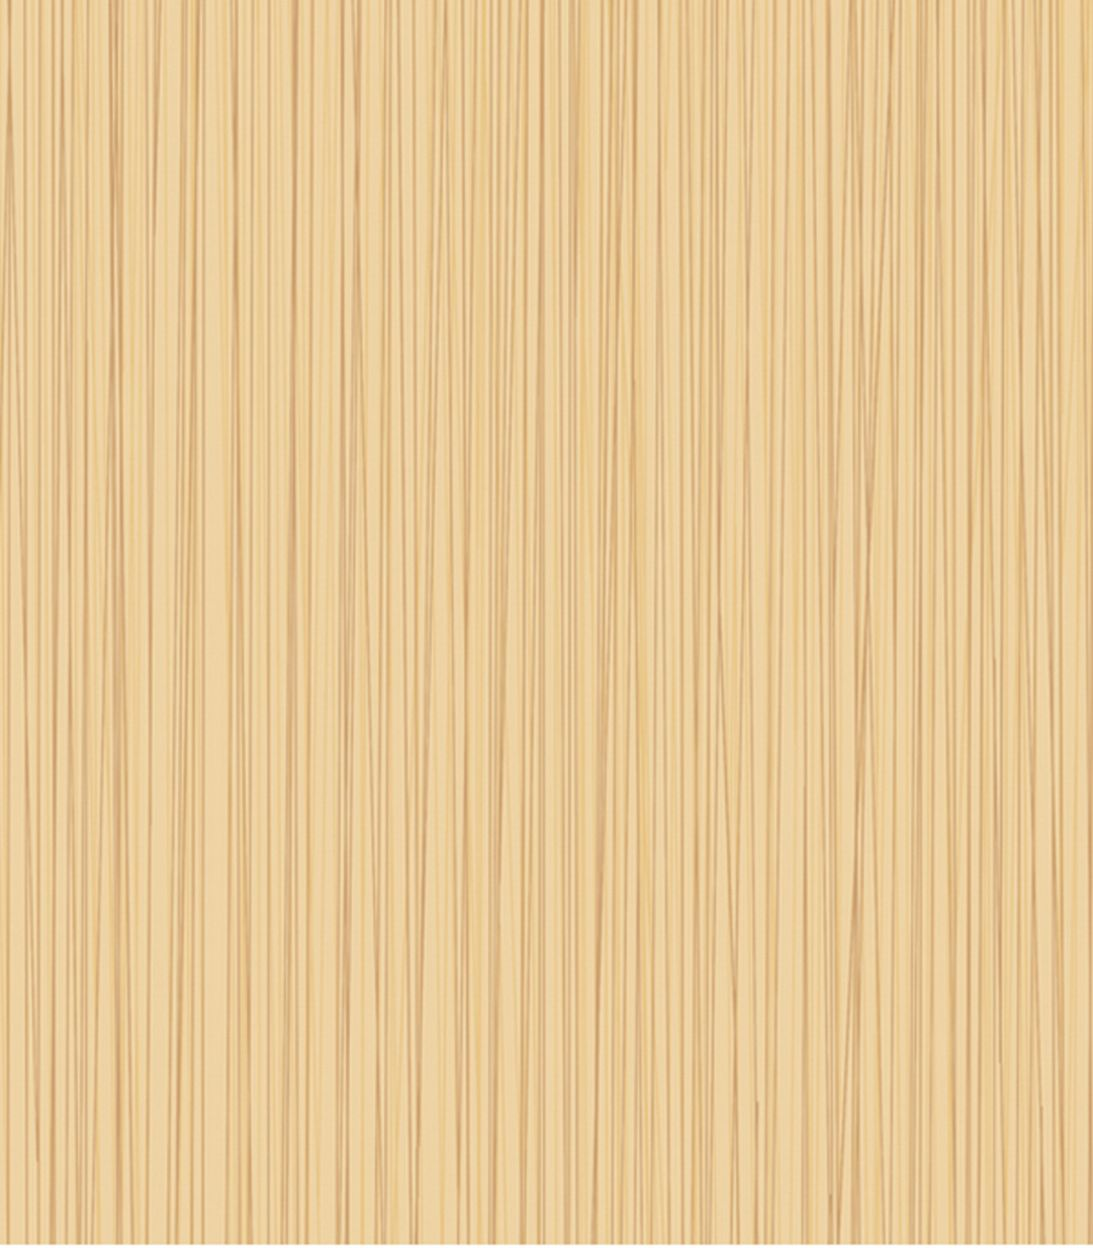 ПлиткаоблицовочнаяCersanitMito Light бежевая200x300x7мм(20шт.=1,2кв.м)